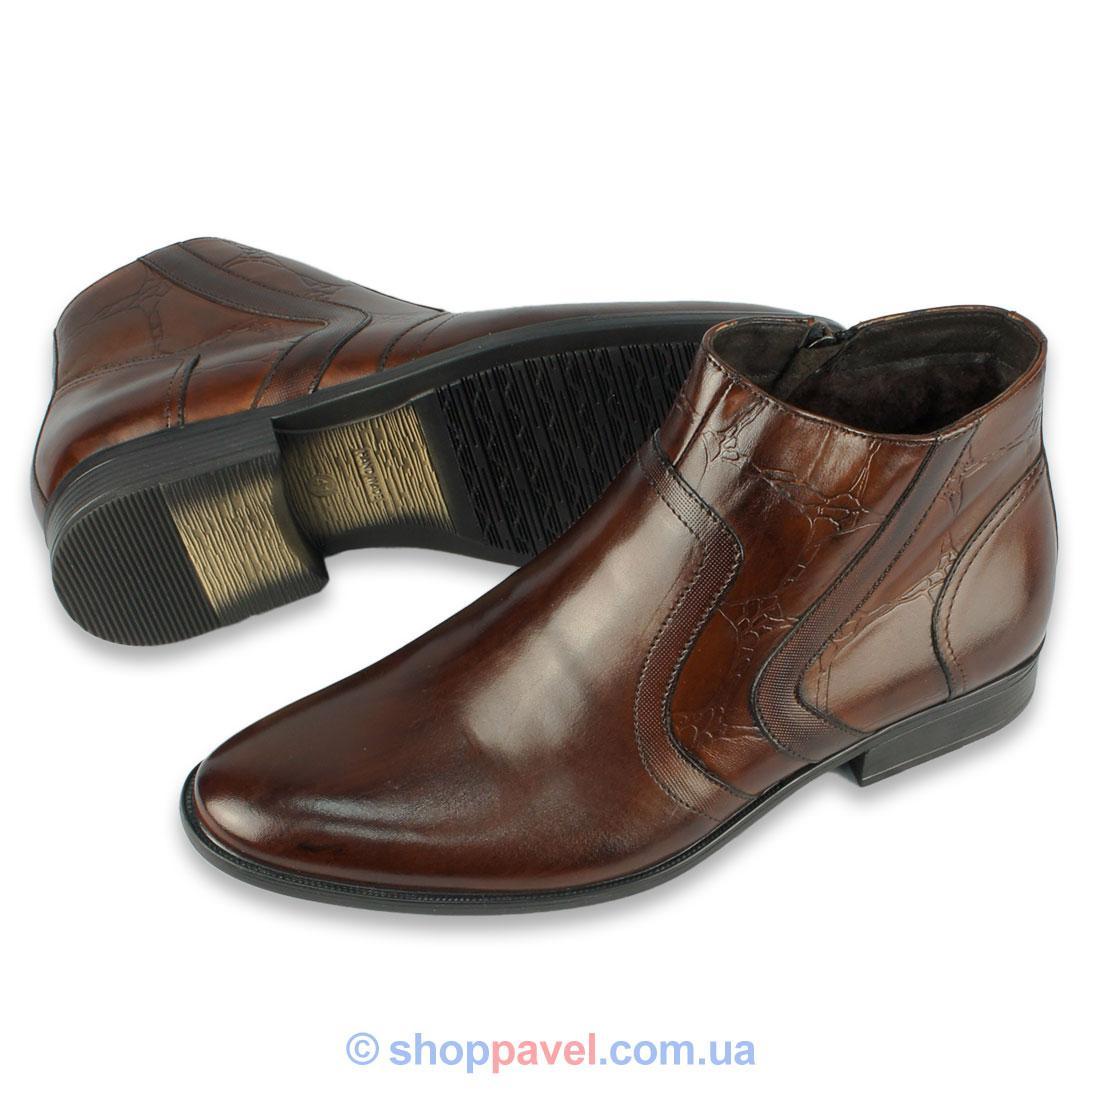 Чоловіче зимове взуття в Днепре. Сравнить цены bbcc75528549a